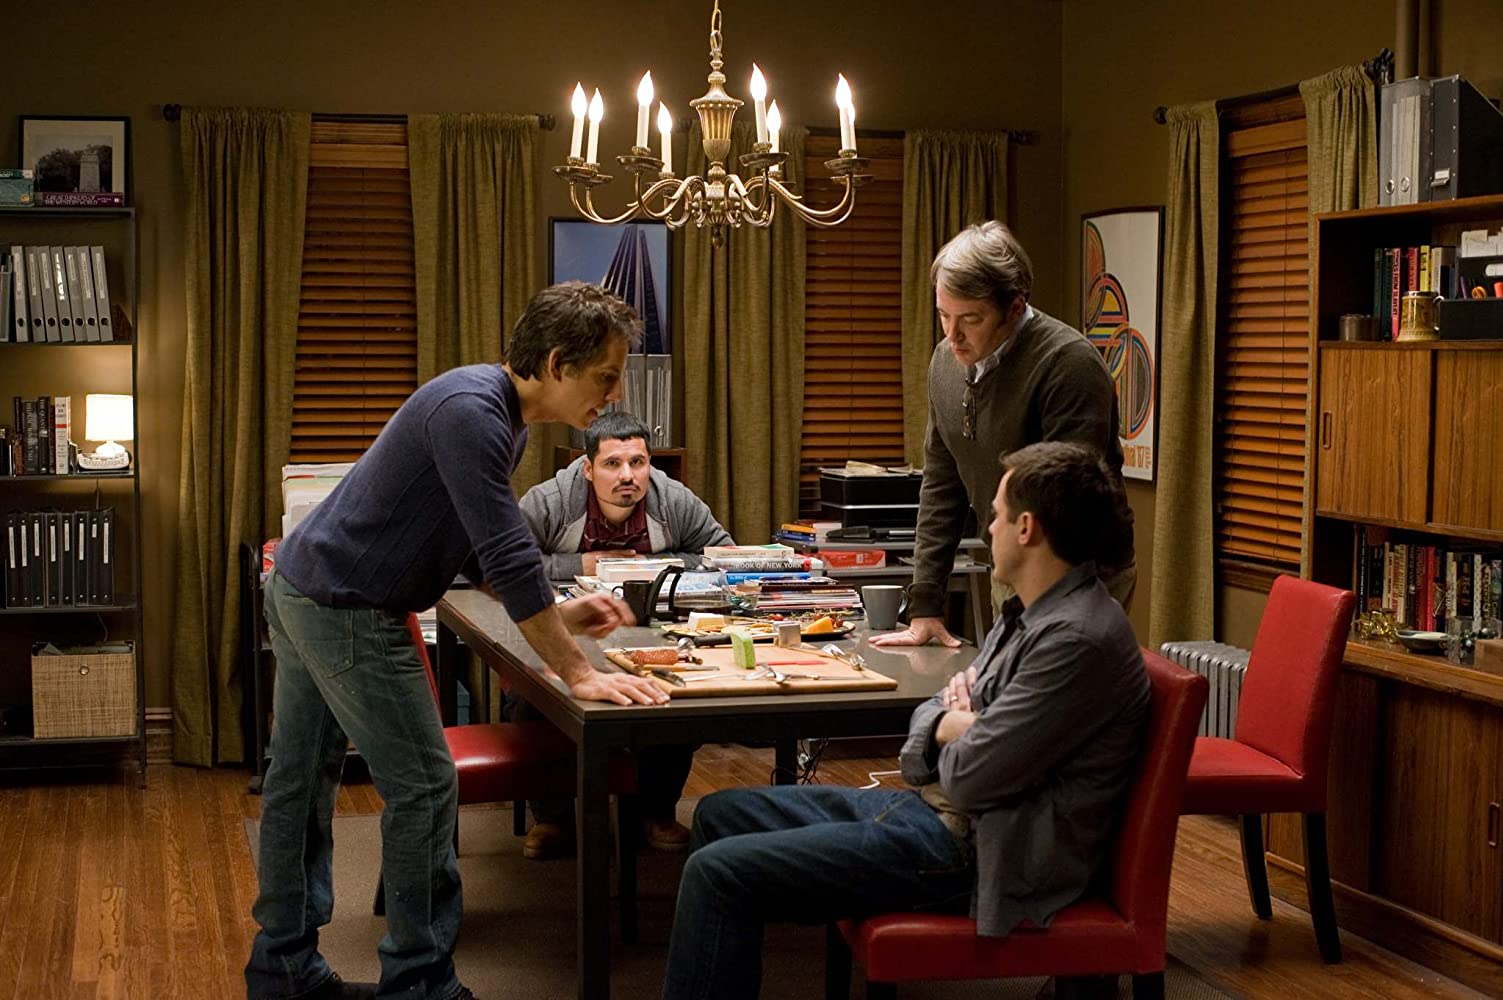 Matthew Broderick, Casey Affleck, Ben Stiller, and Michael Peña in Tower Heist (2011)